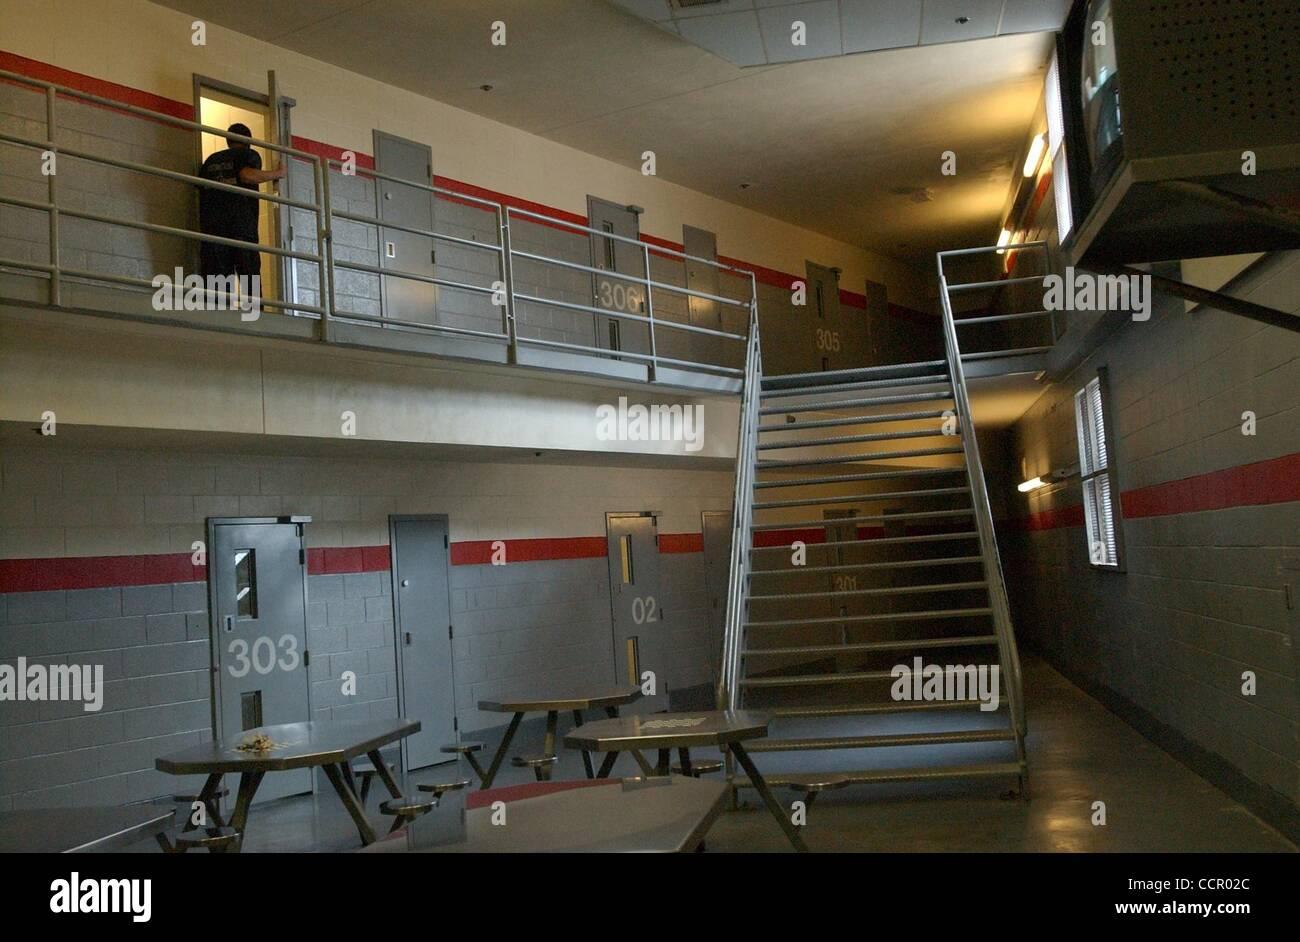 Oct 6 2010 Atlanta Ga U S Fulton County Jail